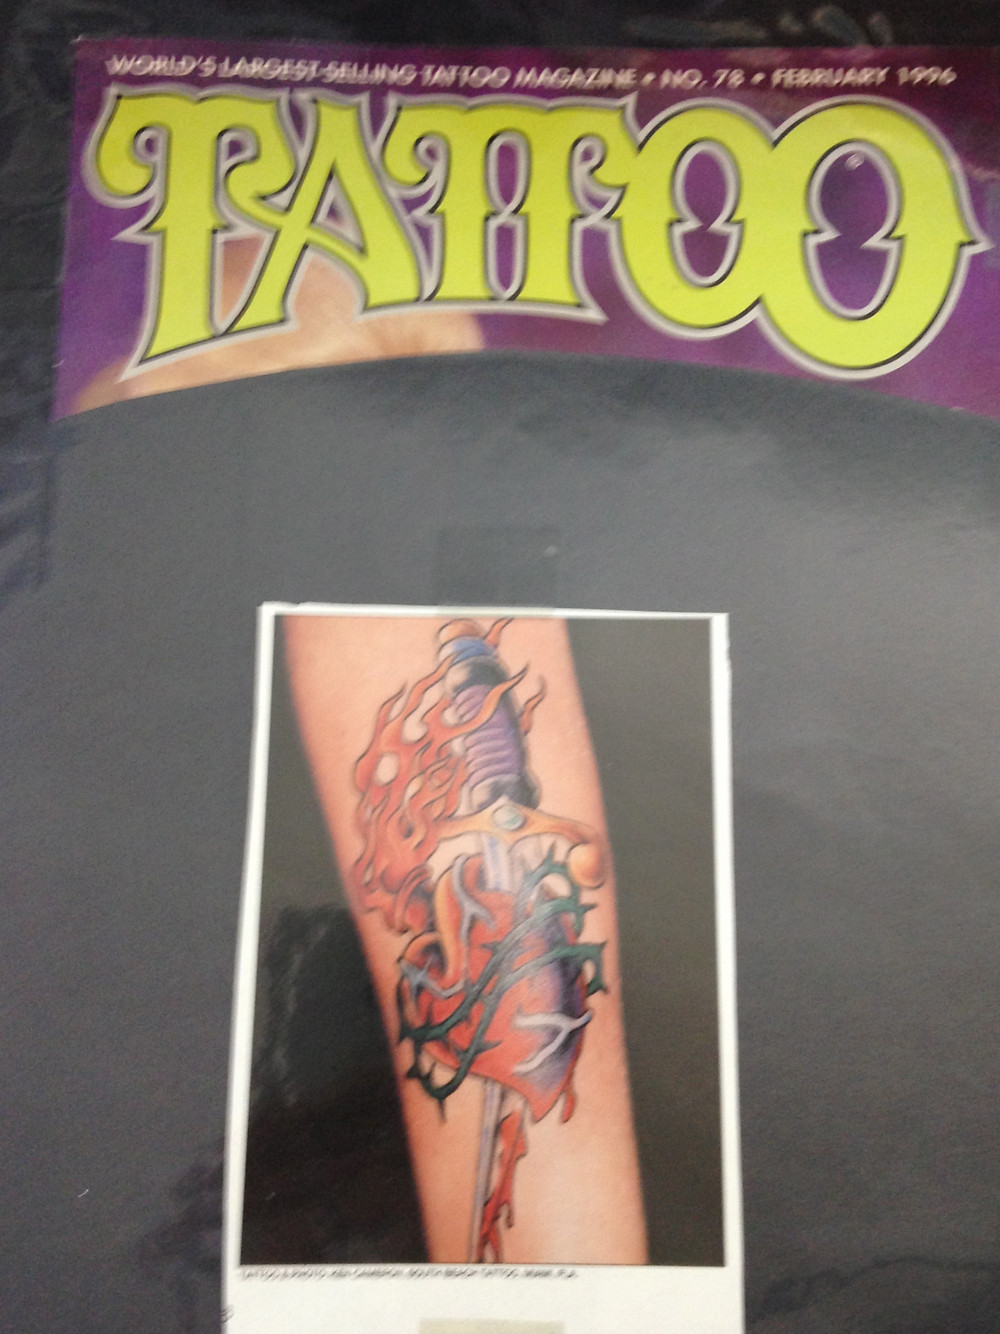 Tattoo Magazine February 1996